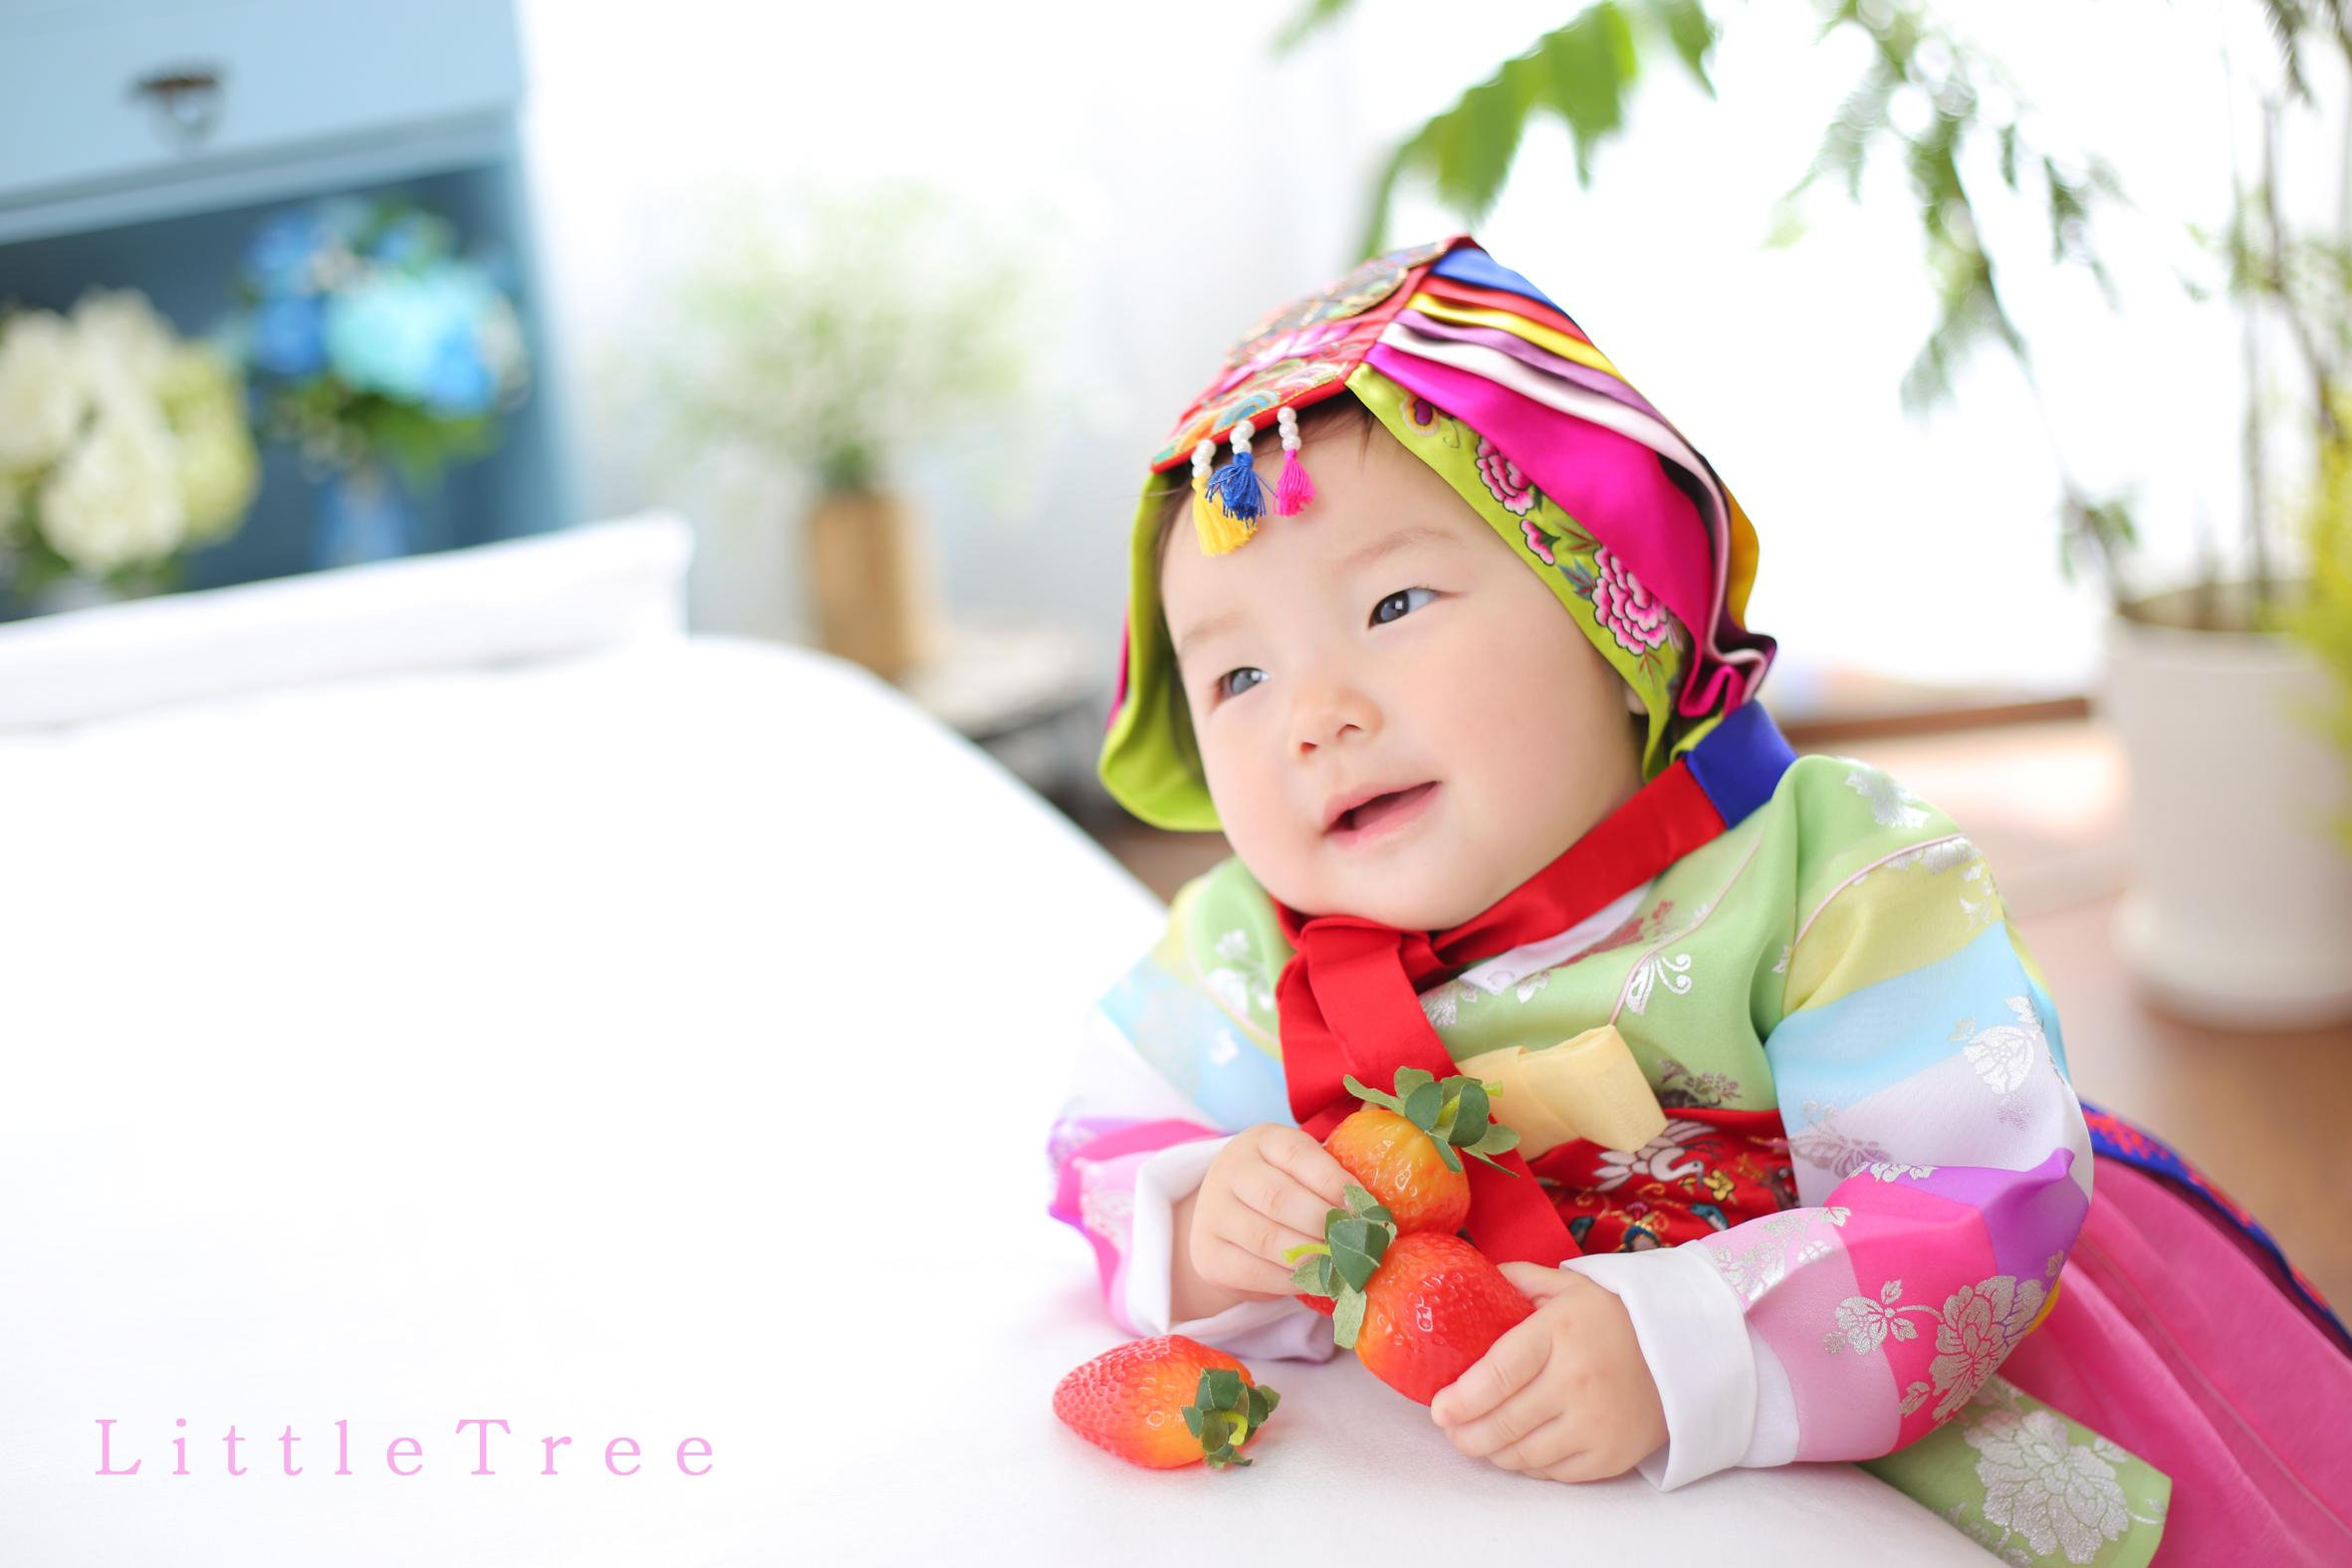 littletree korean(1).JPG